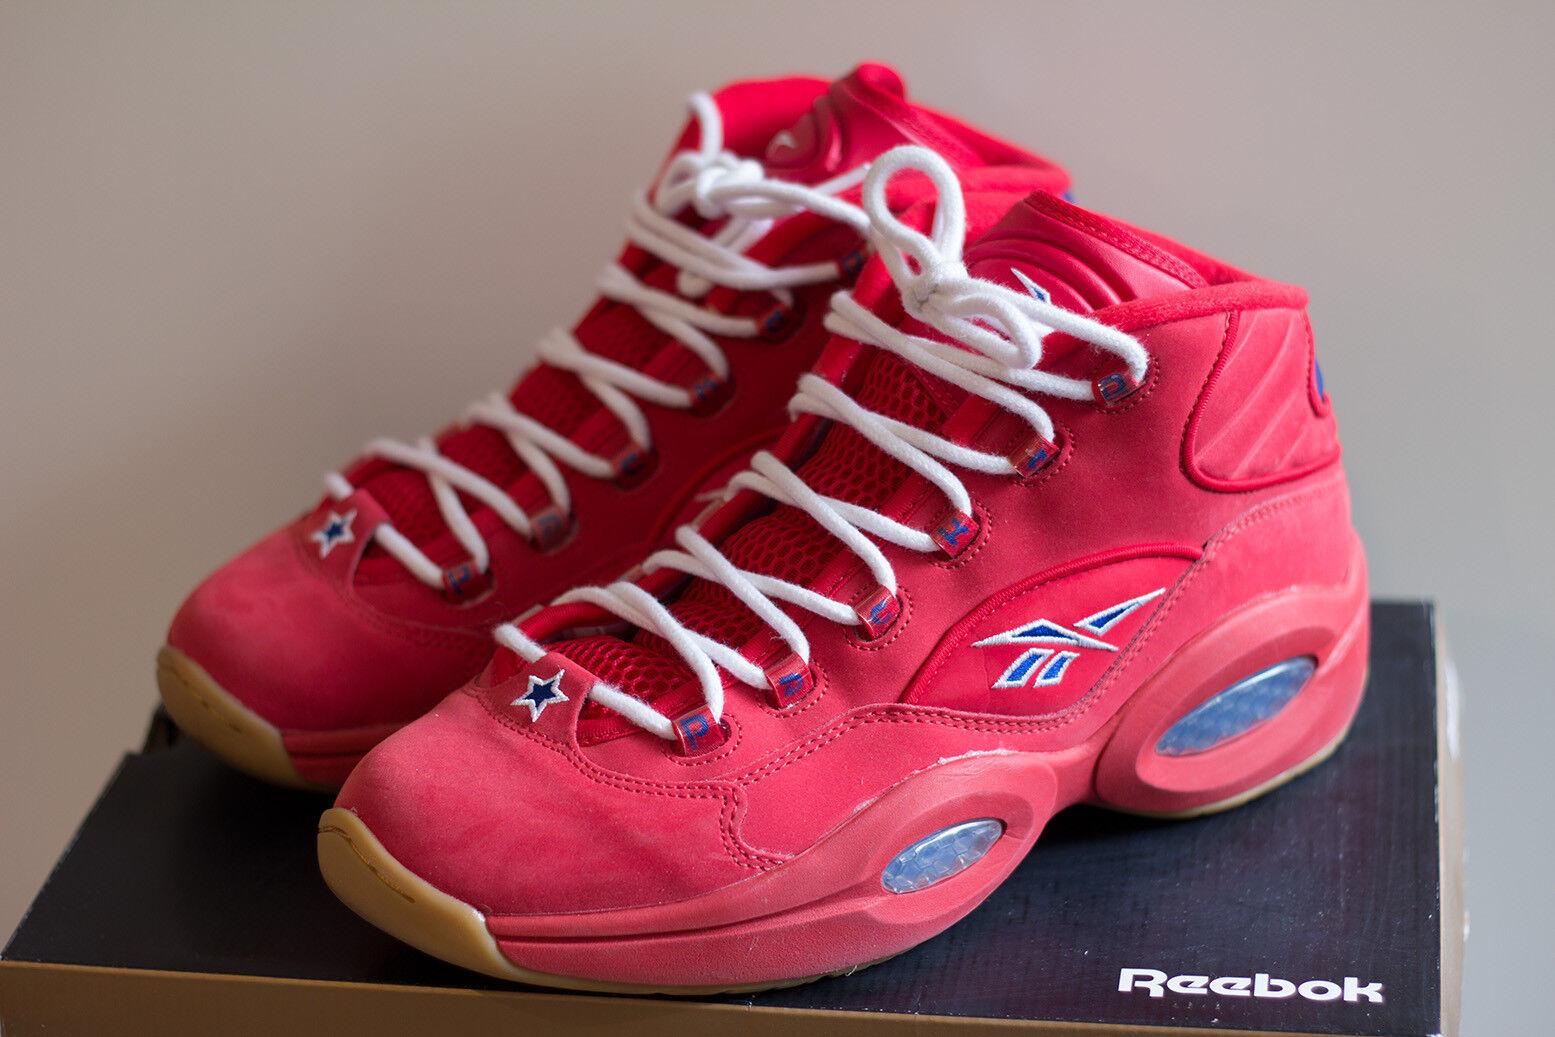 Reebok Question Packer scarpe kamikaze rosso Suede GUM Iverson senza PUMP